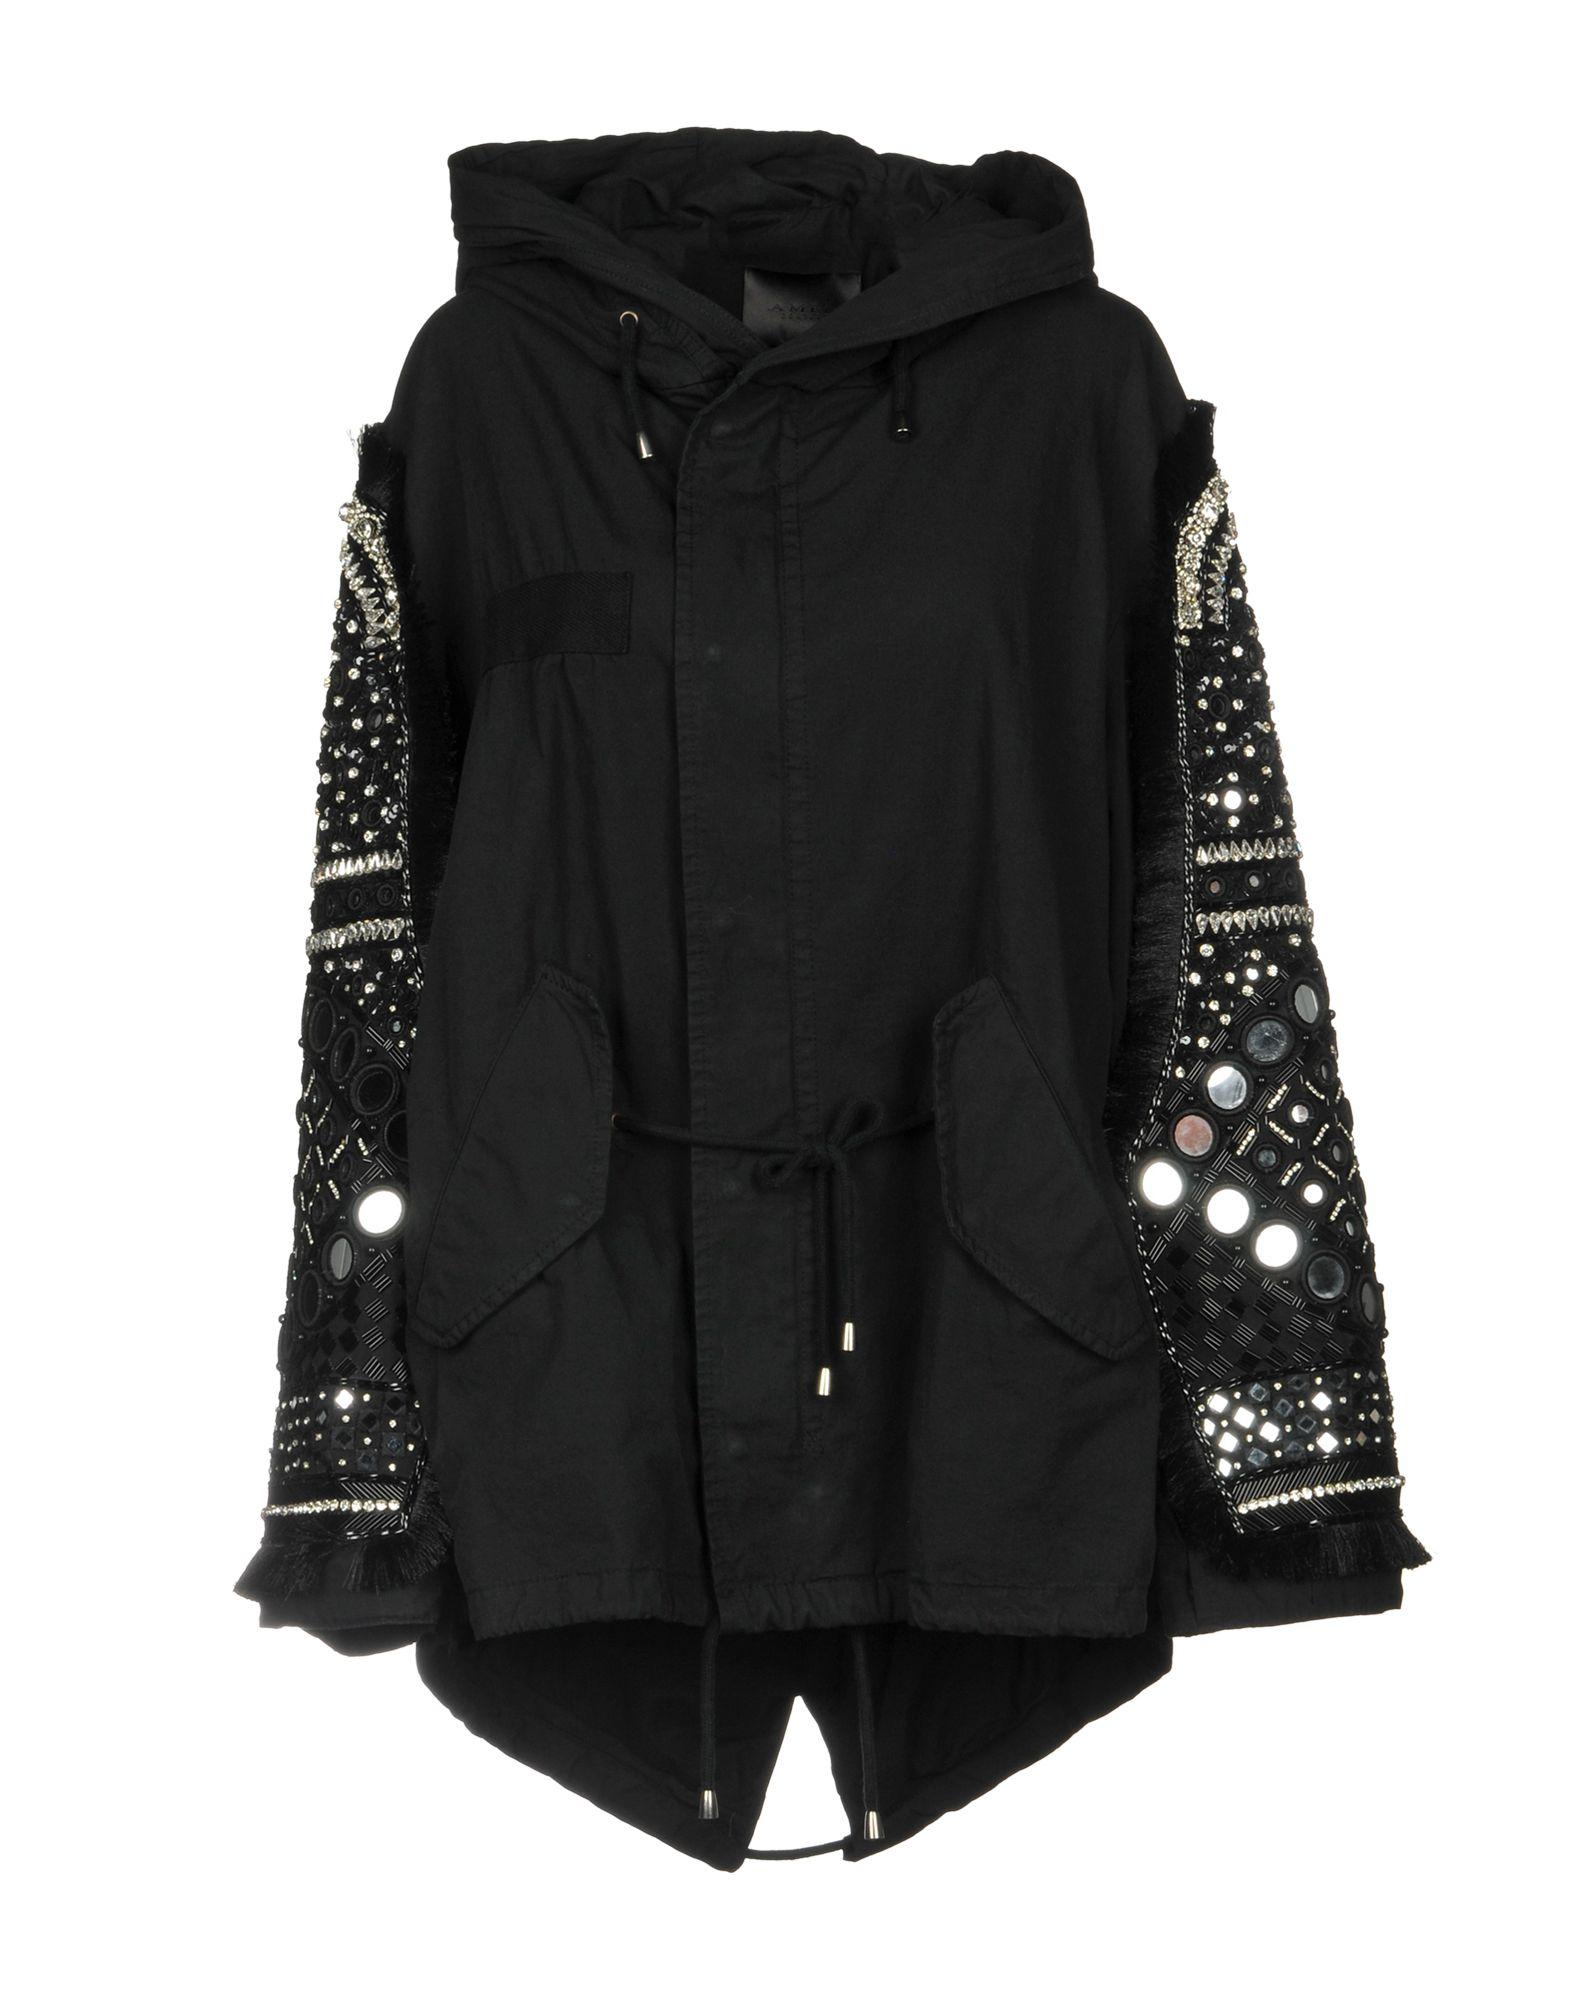 AMEN COUTURE Coat in Black